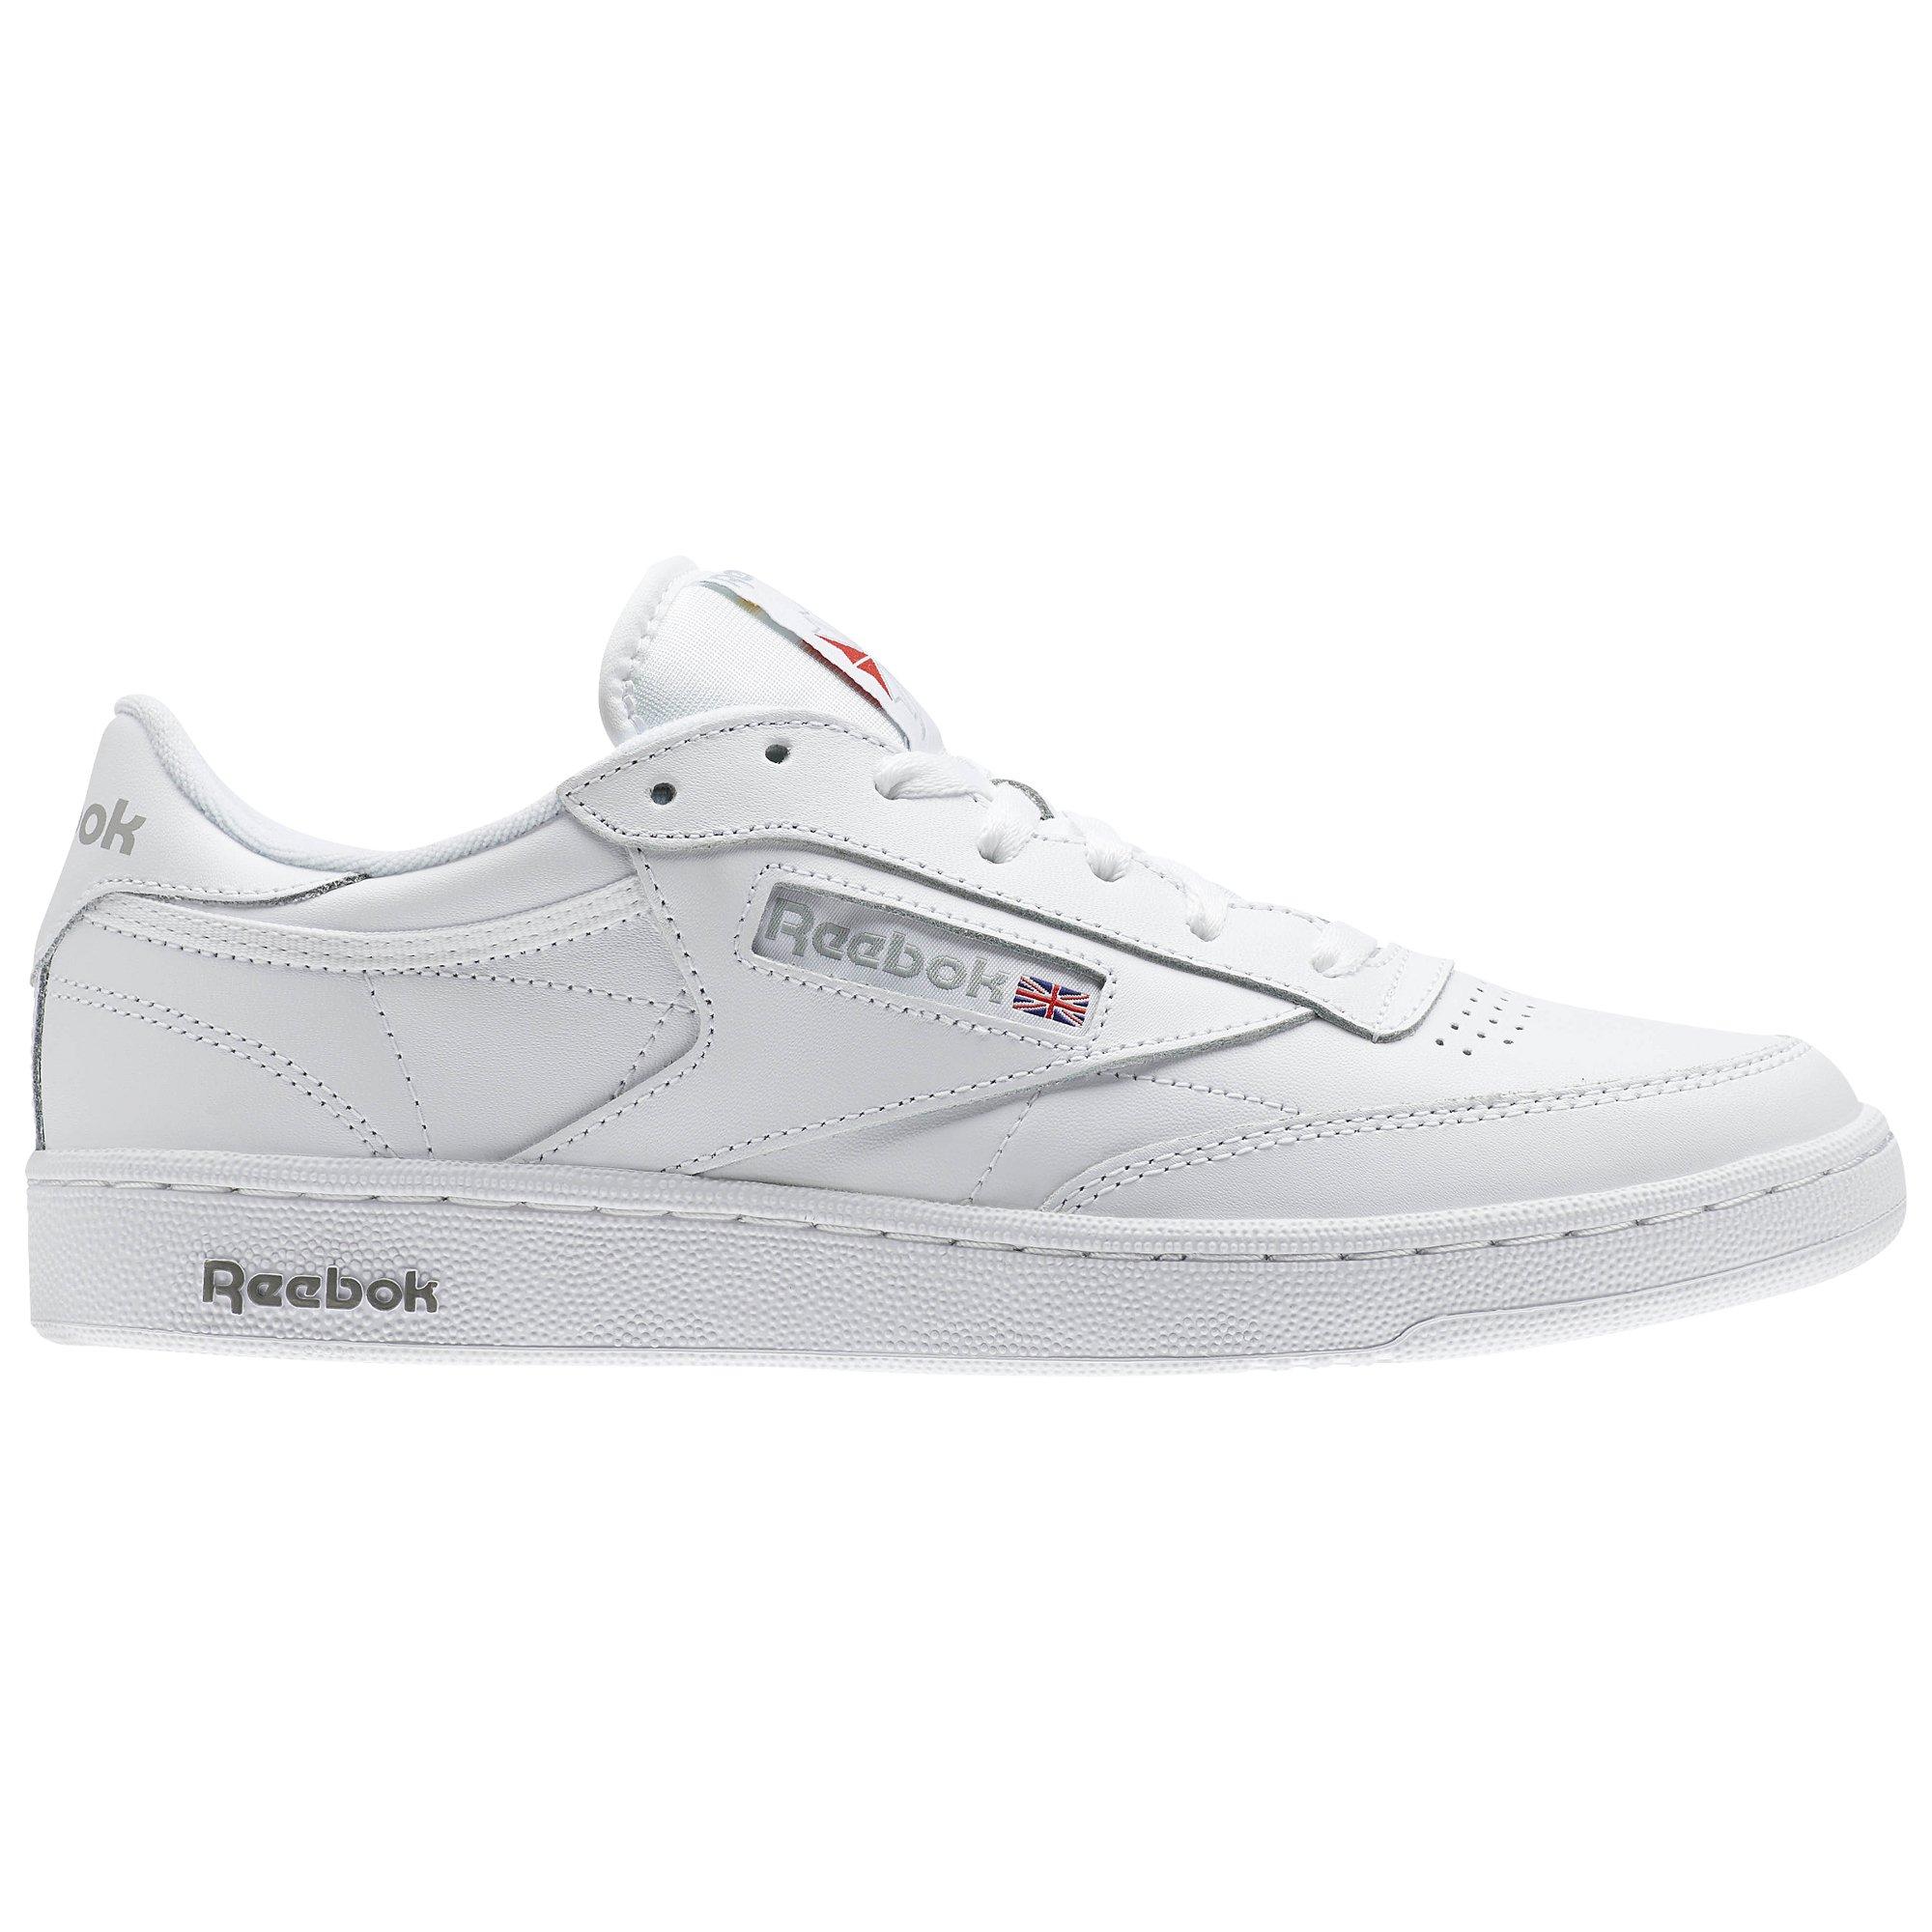 Reebok Men's Club C 85 Walking Shoe, White/Sheer Grey, 7.5 M US by Reebok